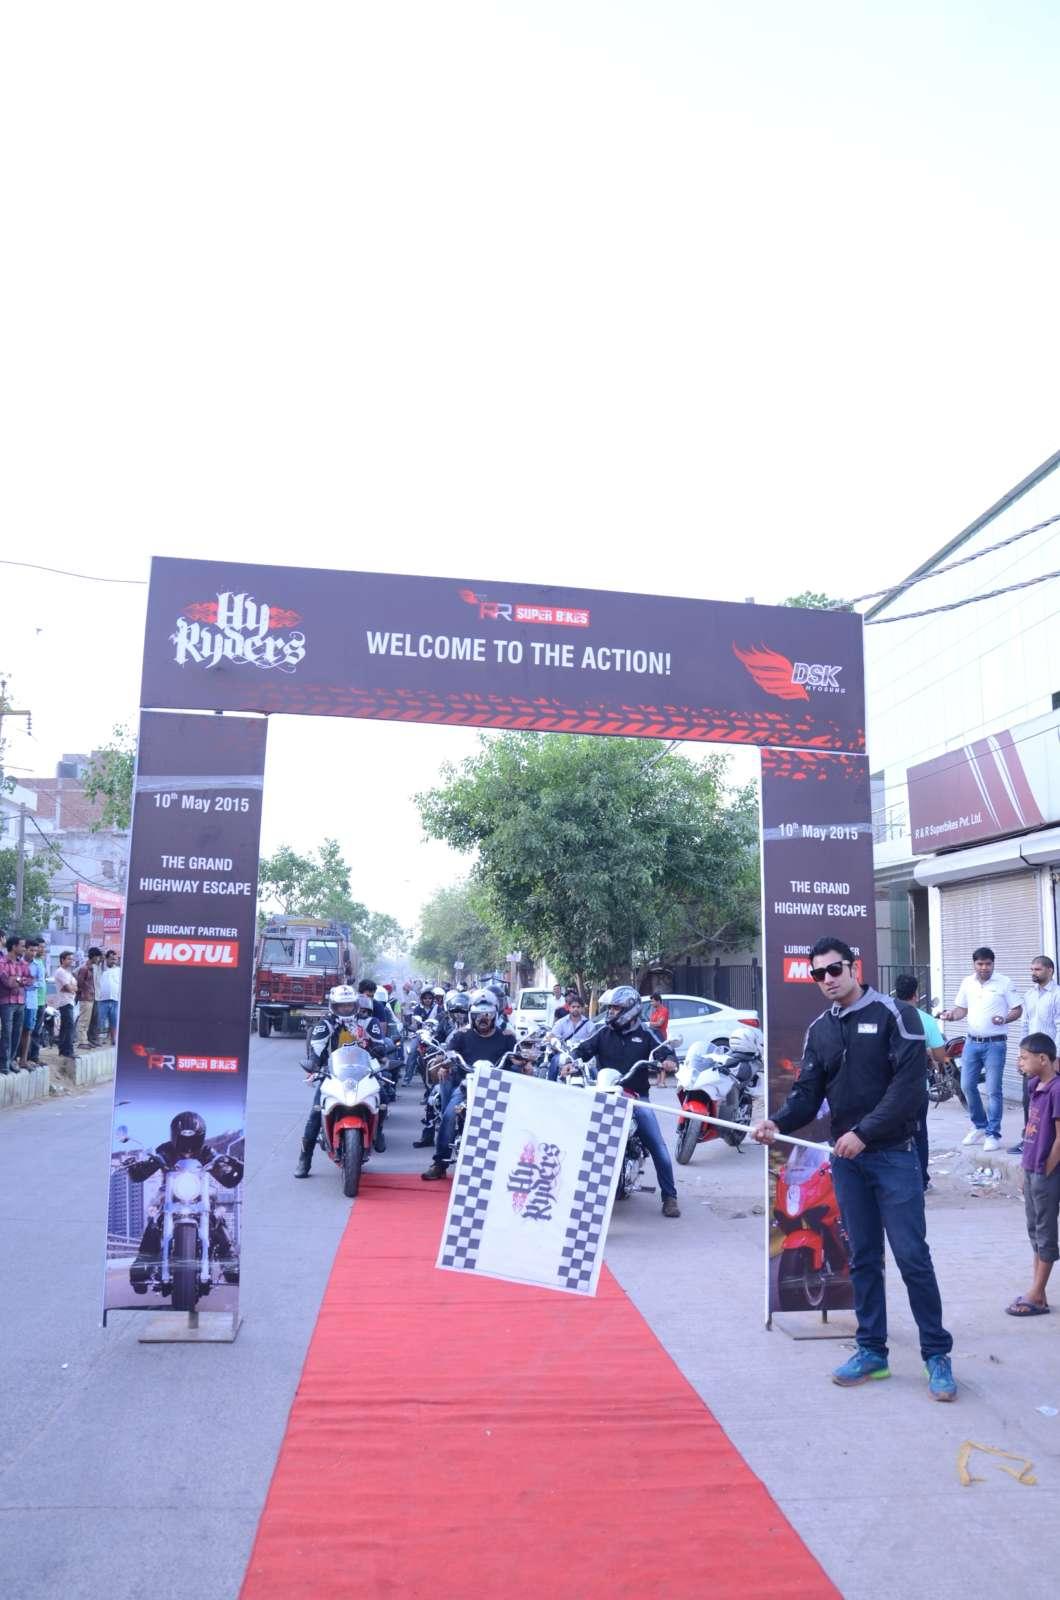 DSK Motowheels organises HyRyders' Club Ride from New Delhi